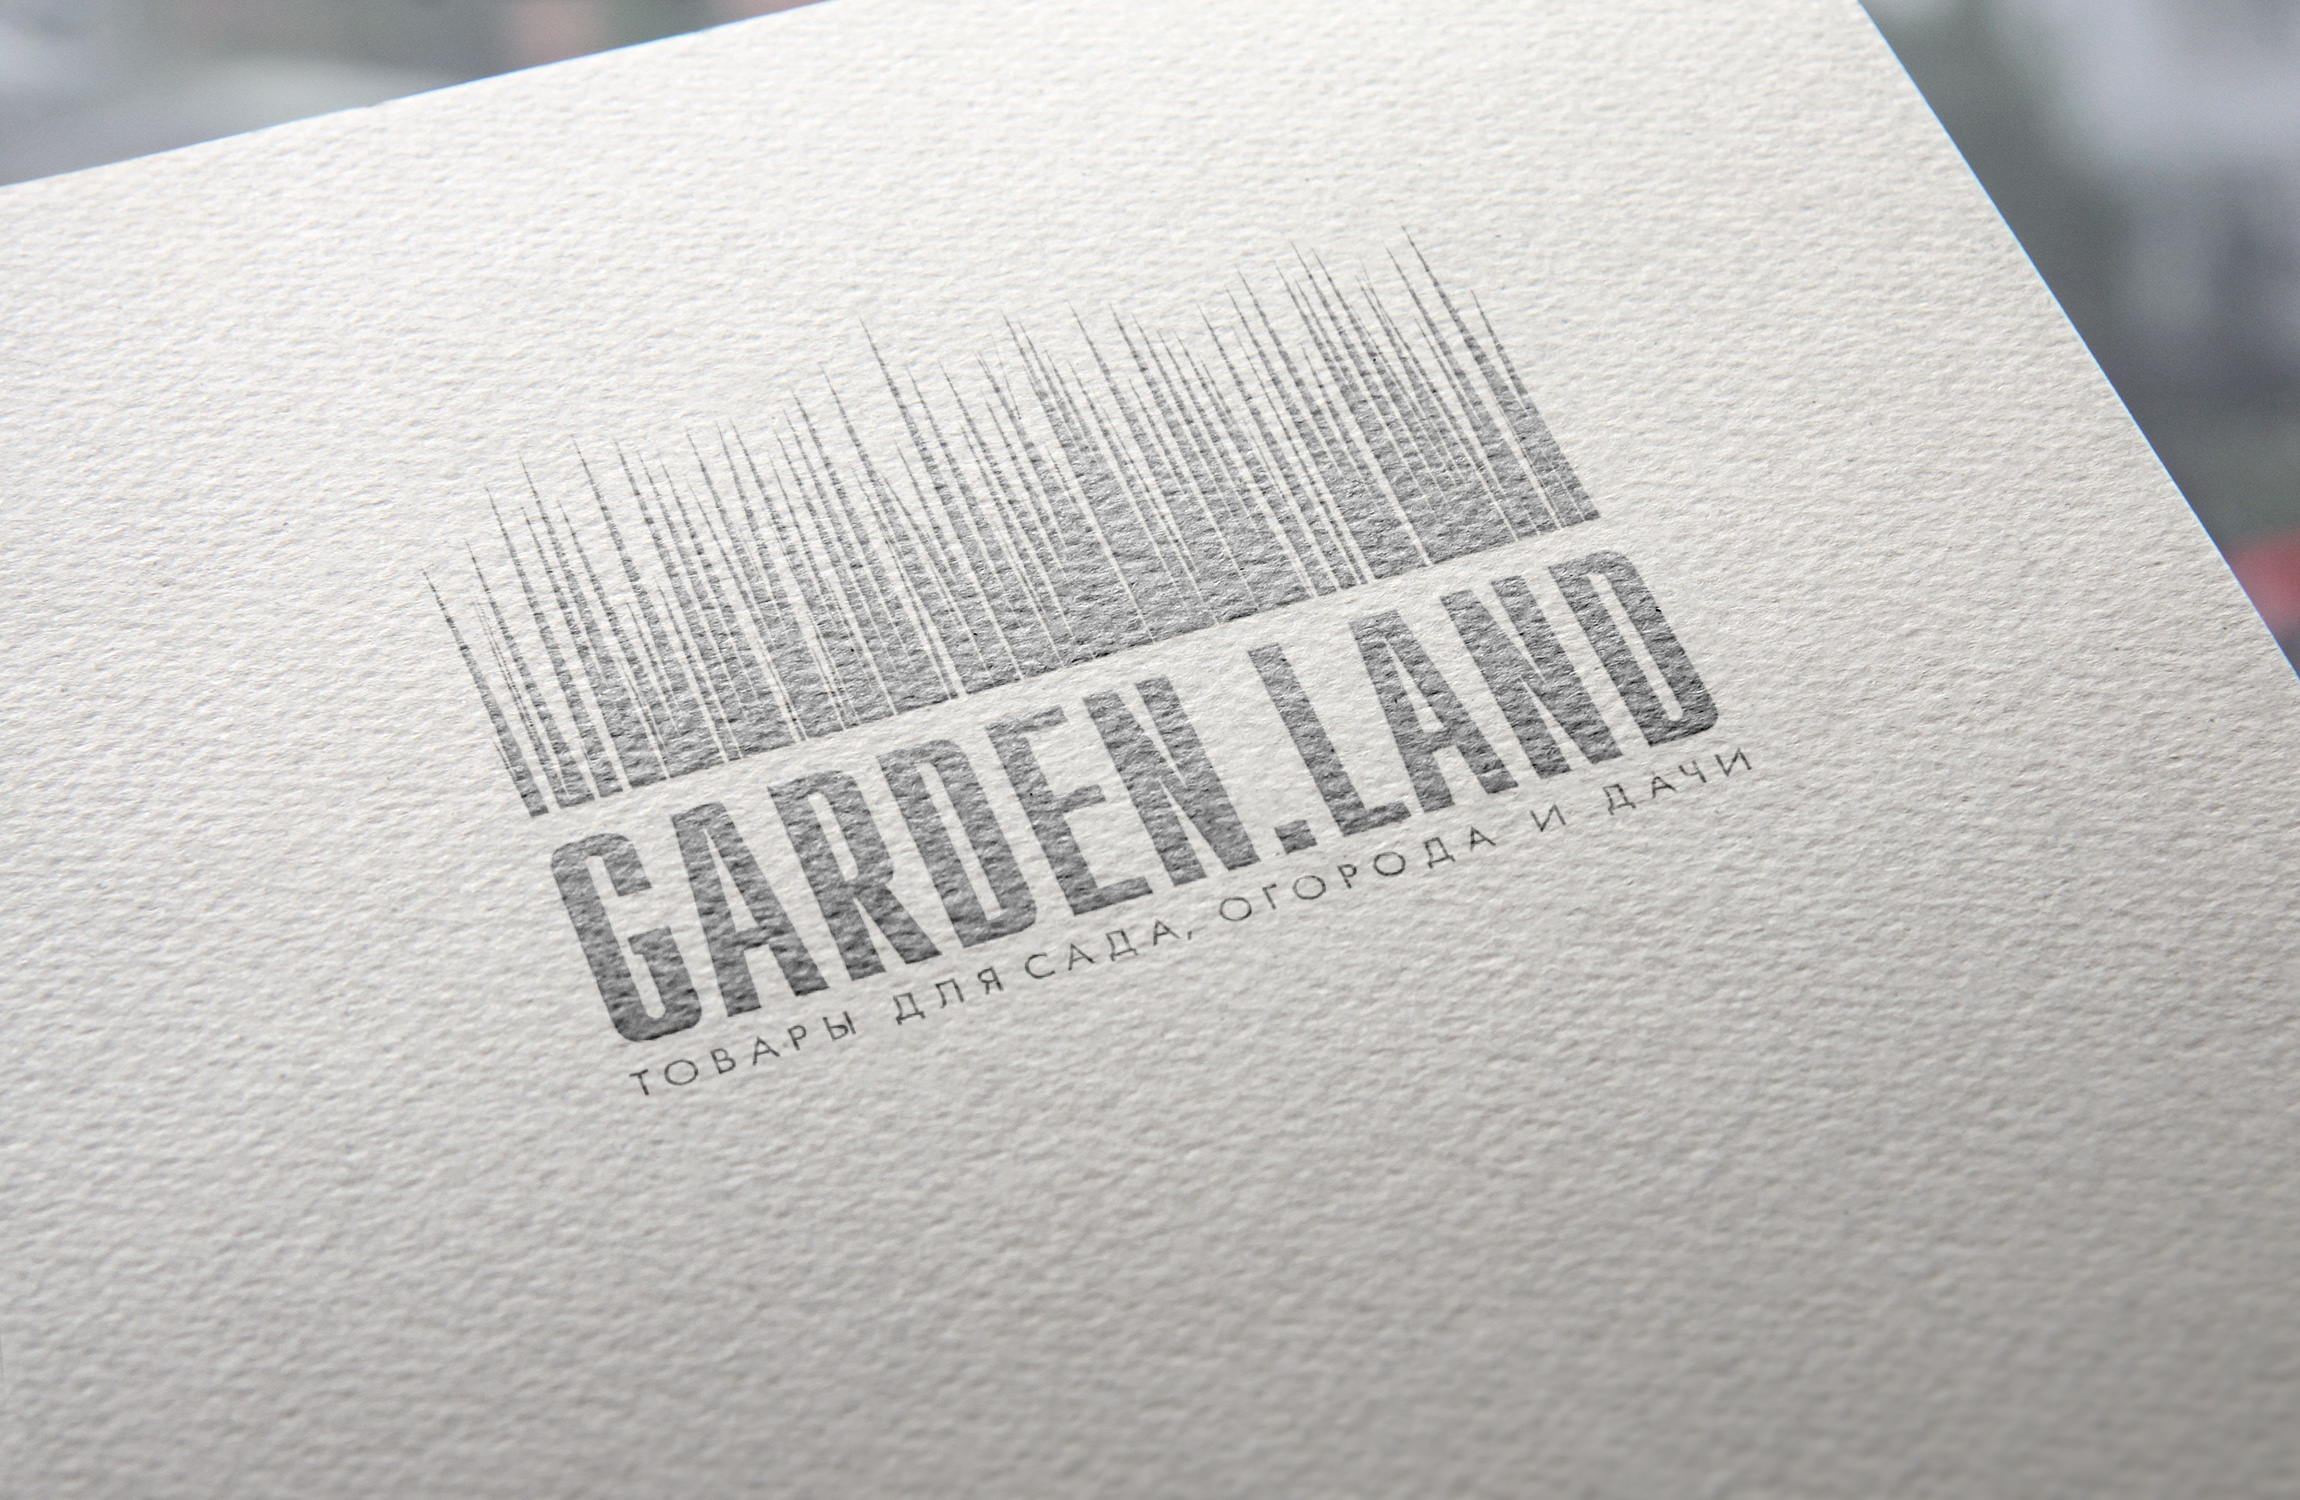 Создание логотипа компании Garden.Land фото f_2725986e7ae1c69a.jpg